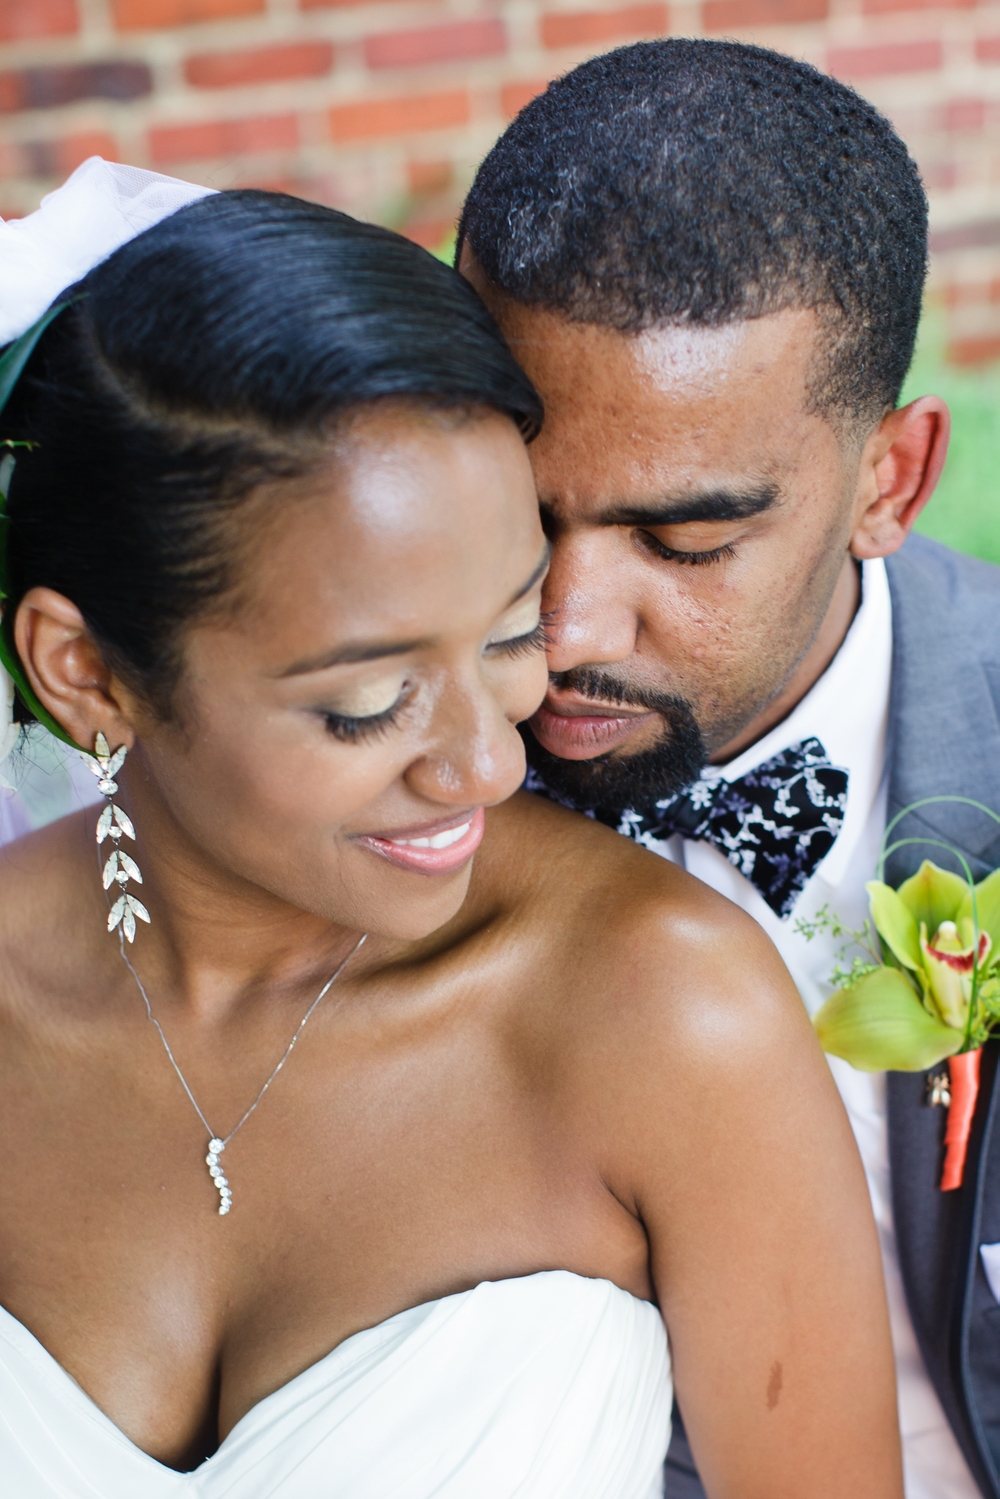 richmond_wedding_photographer_0014.jpg